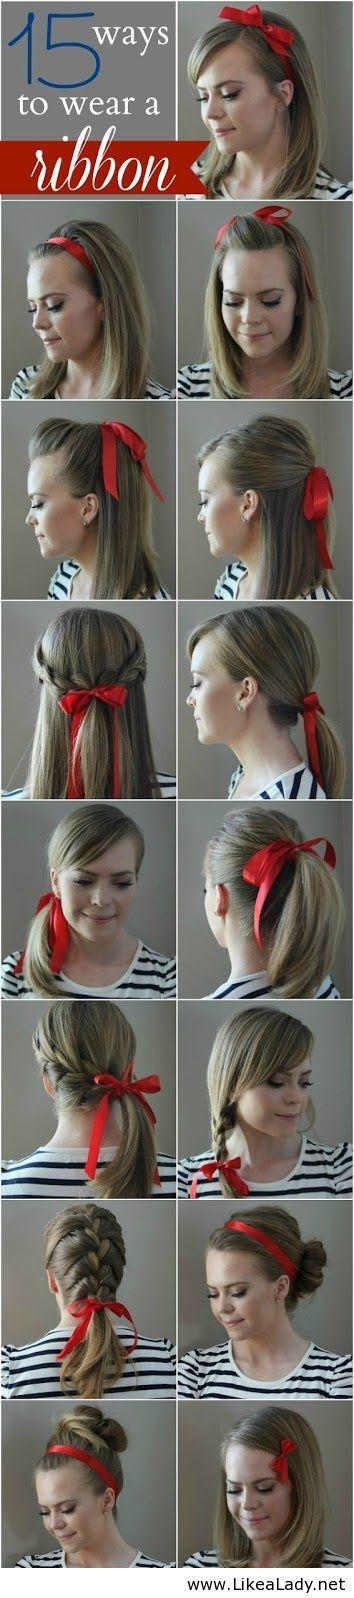 tuto coiffure avec ruban cheveux